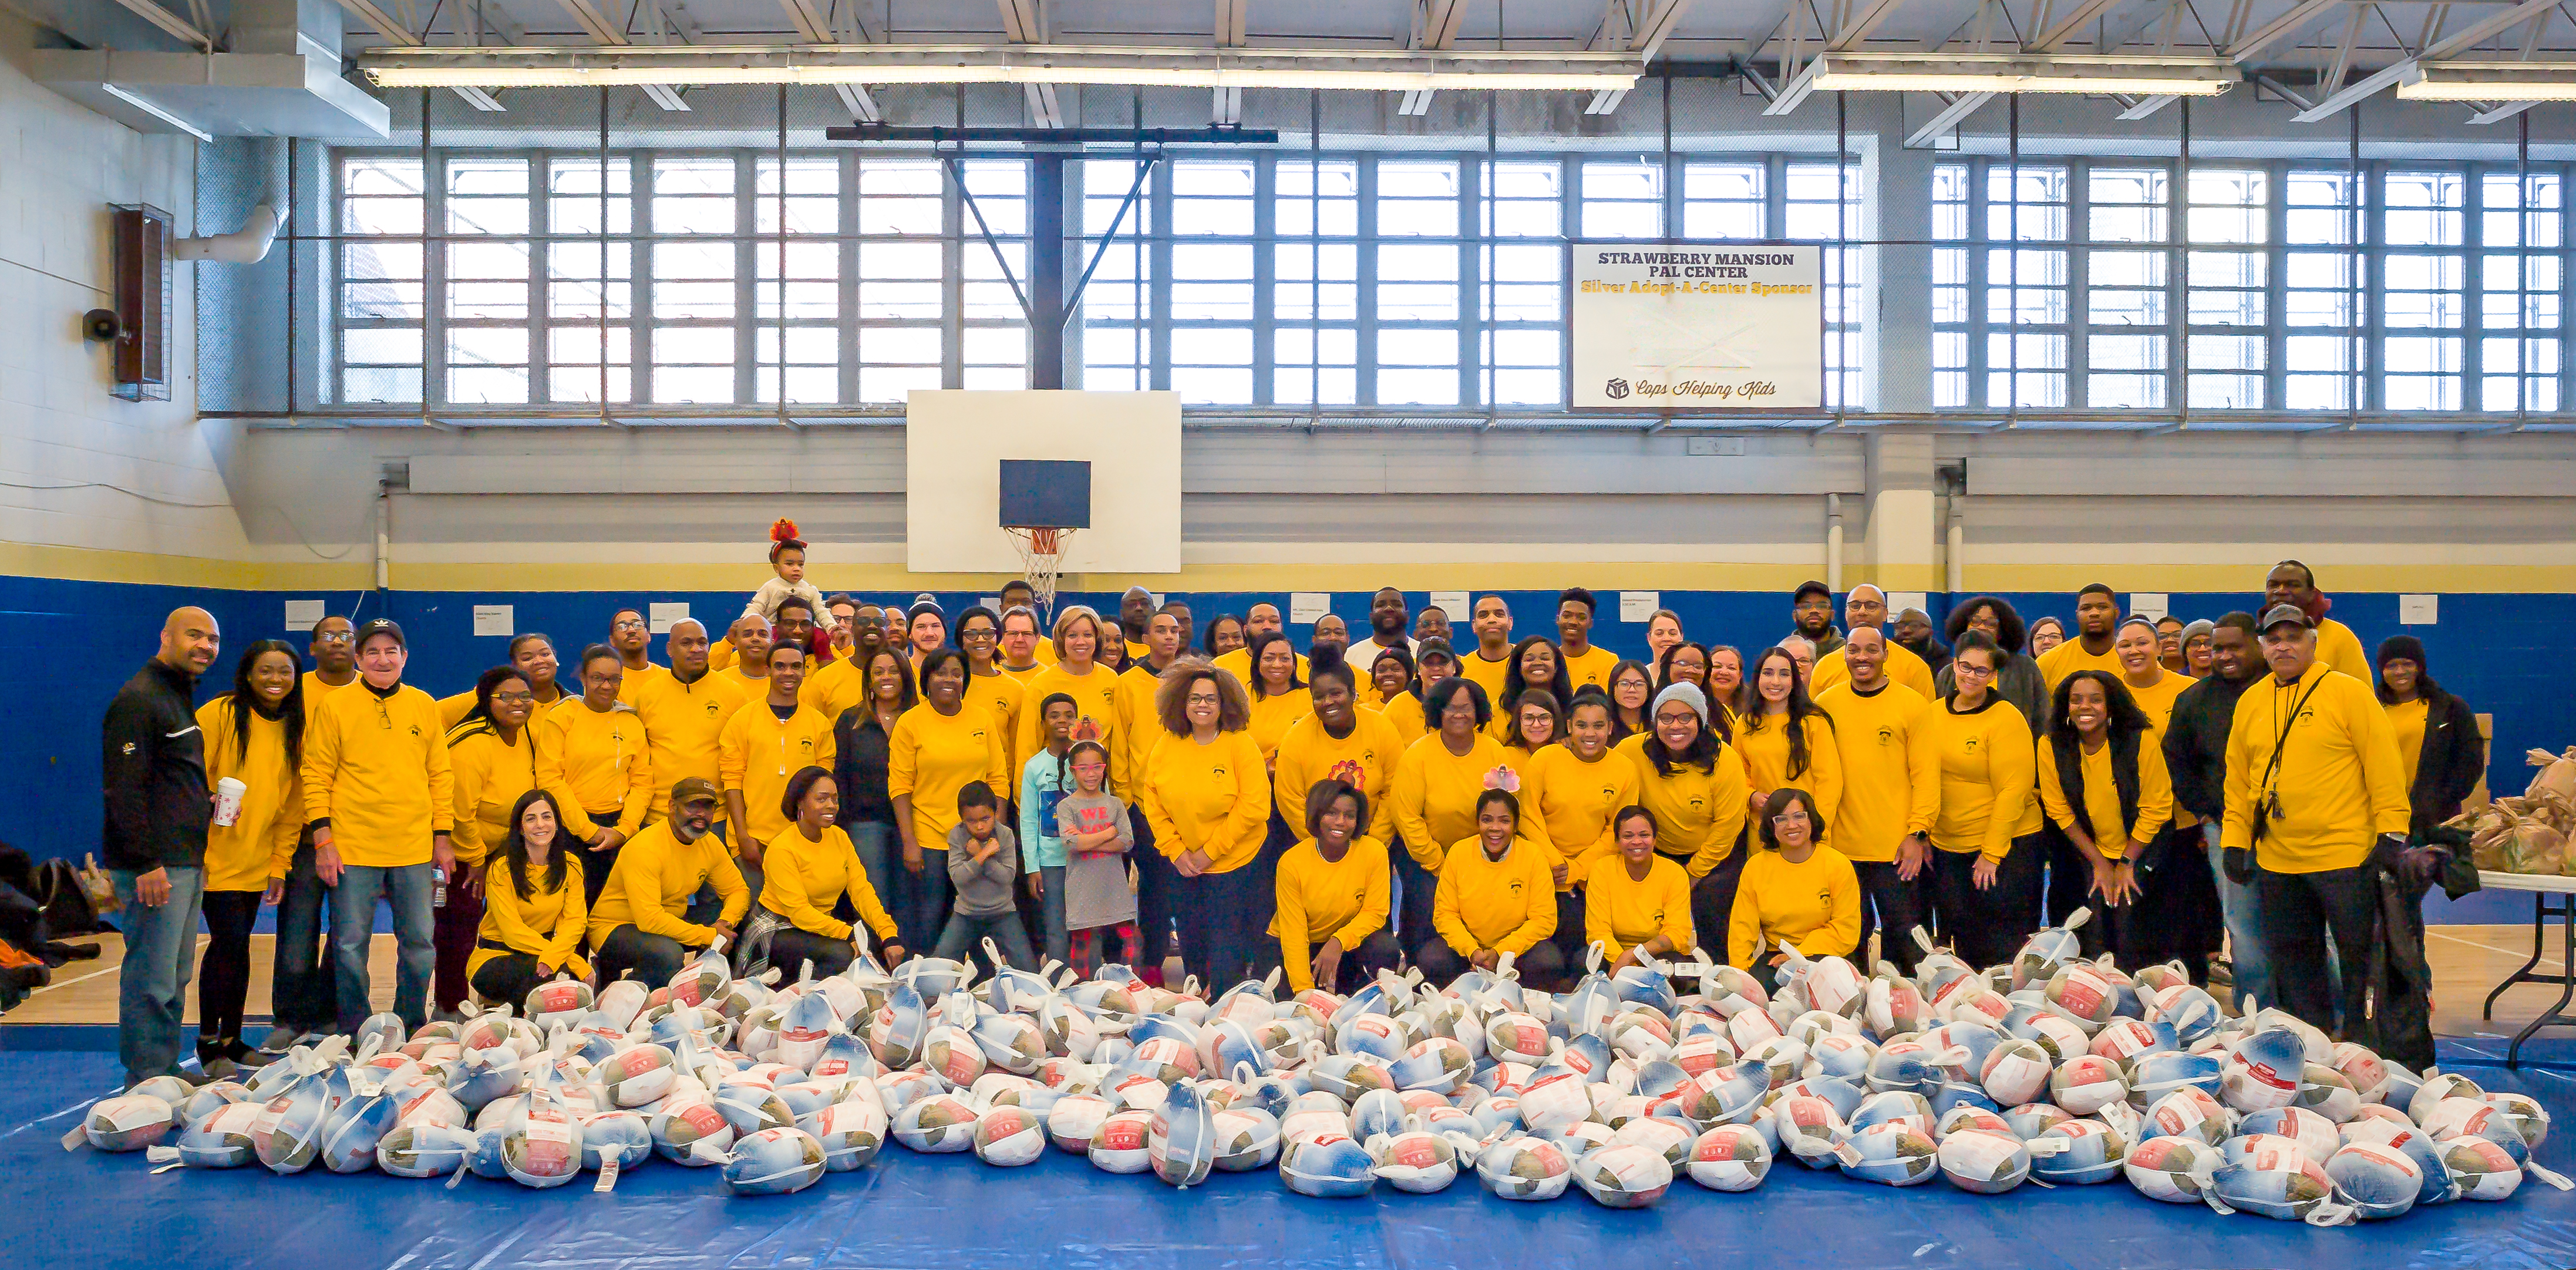 Volunteers with turkeys